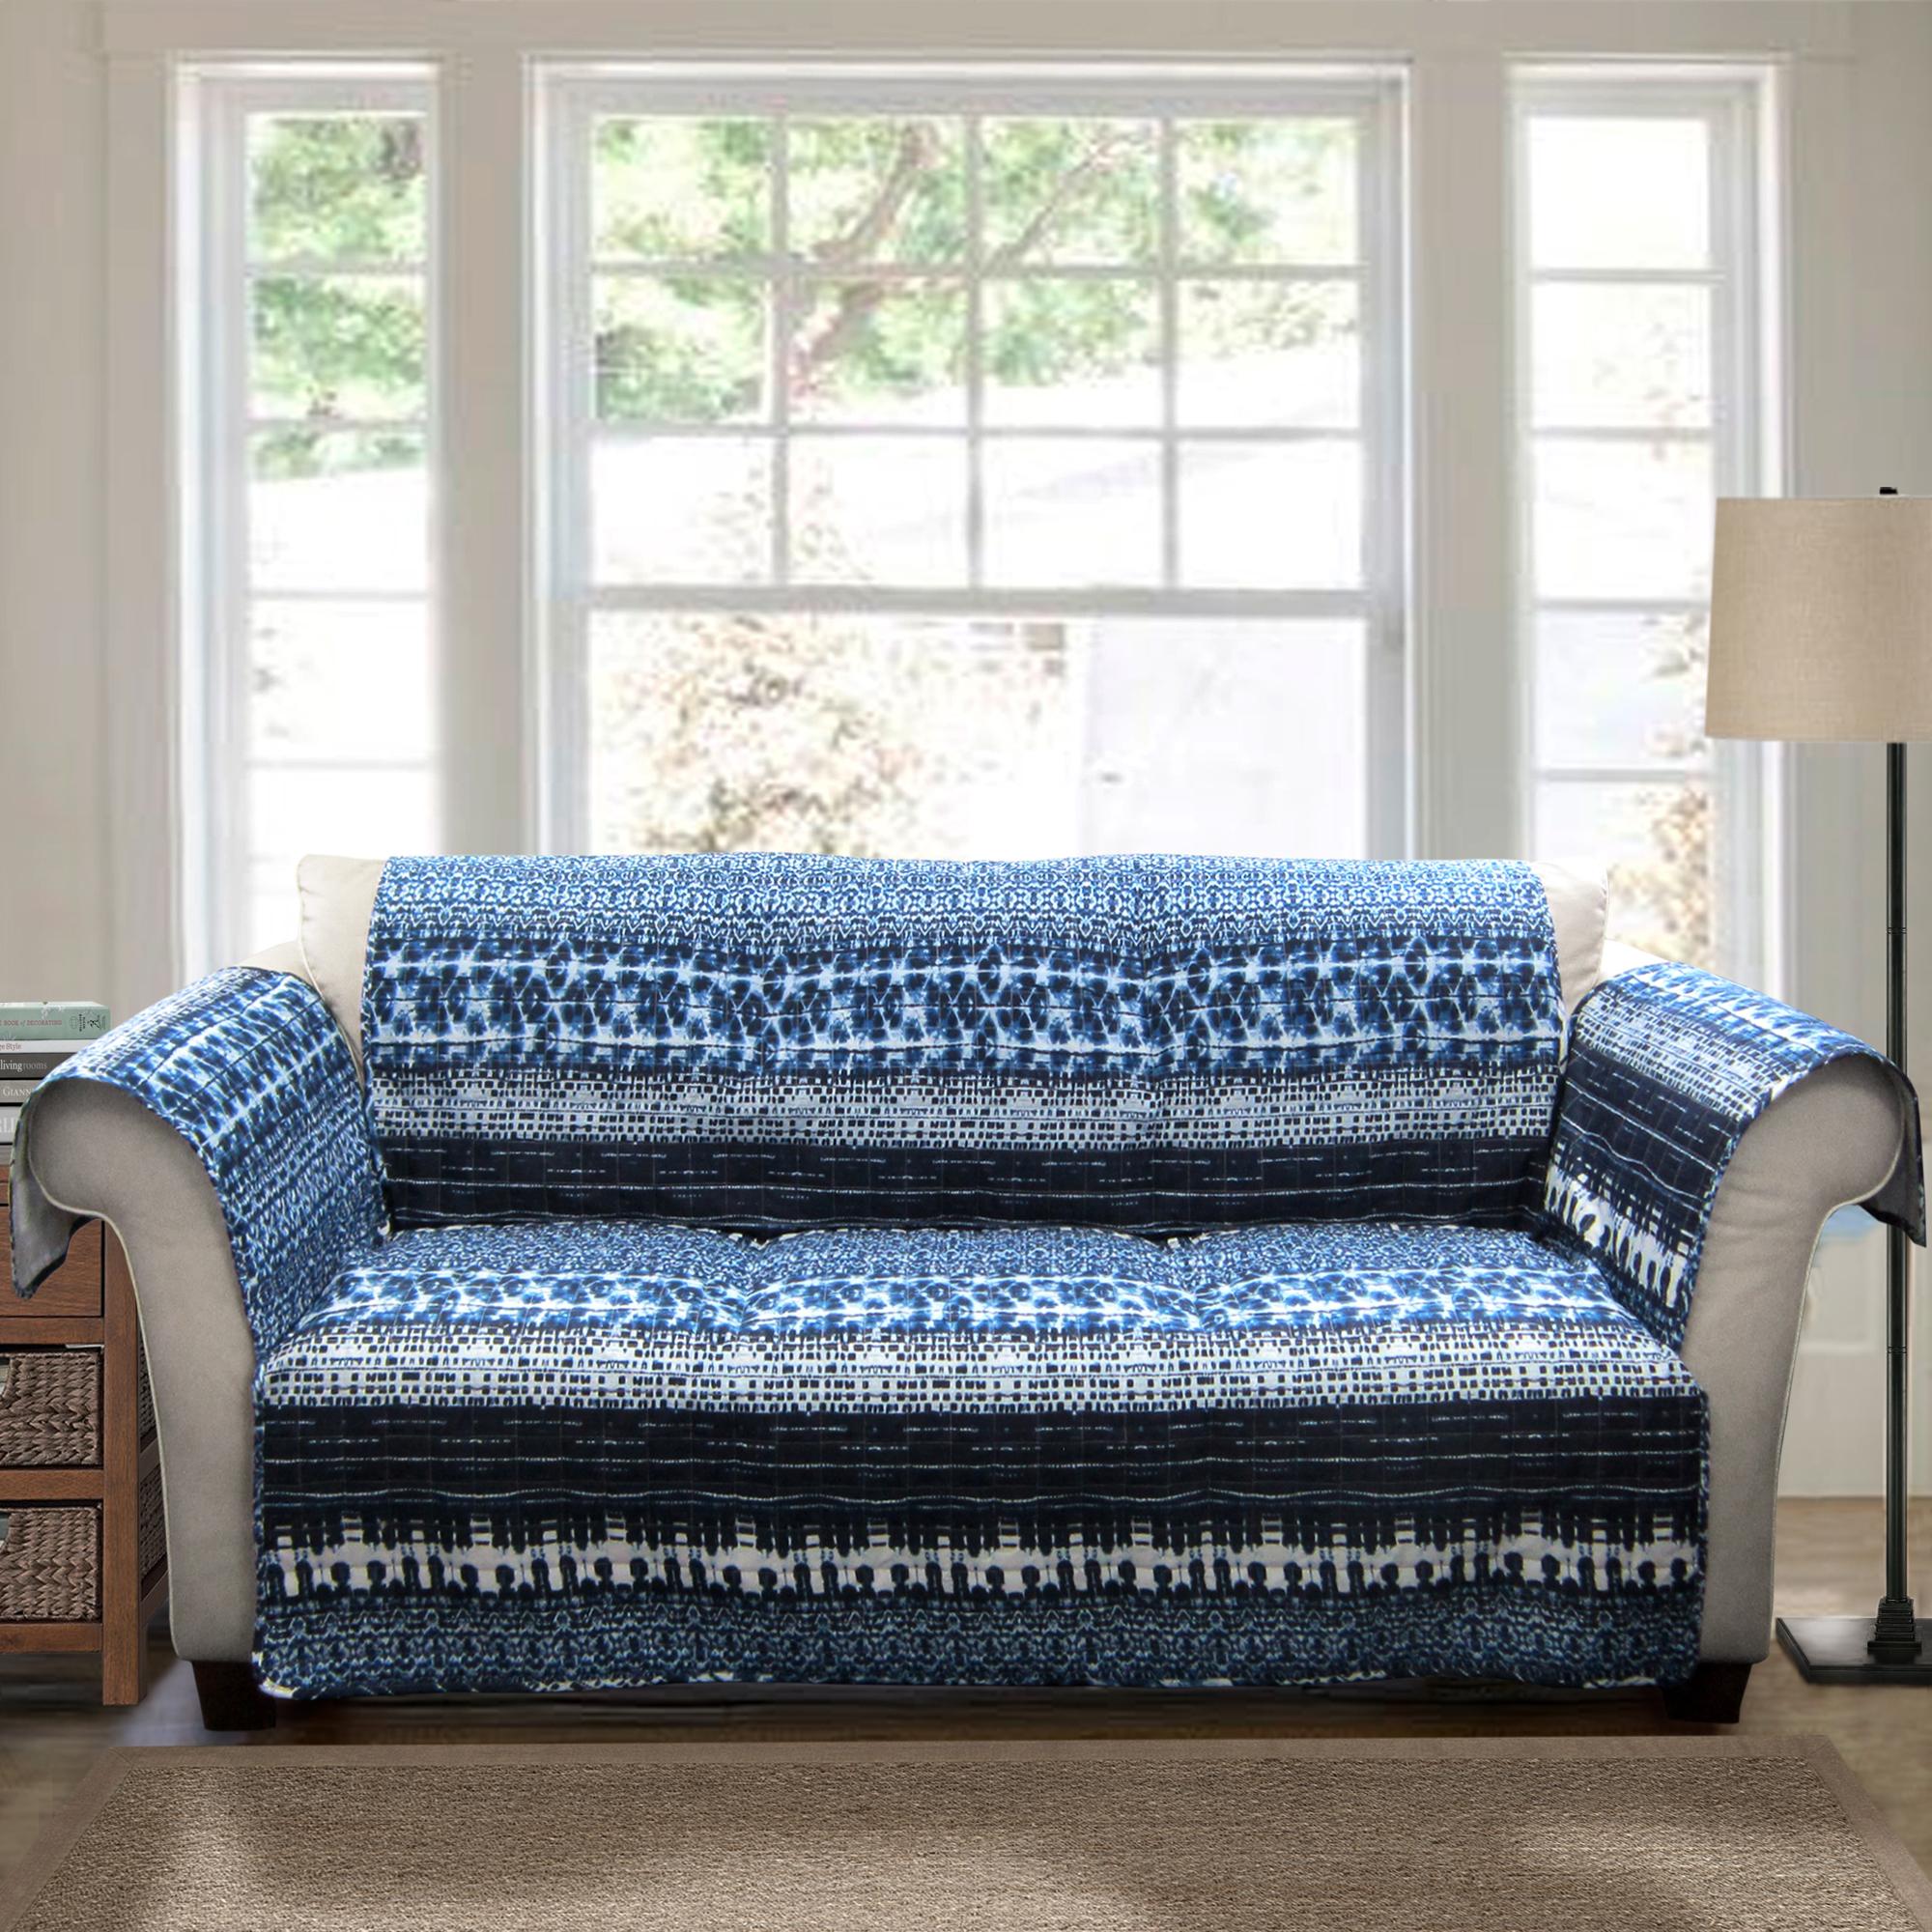 sofa slipcovers kmart australia mart brownsville tx forever new lambert tie dye furniture protectors navy loveseat